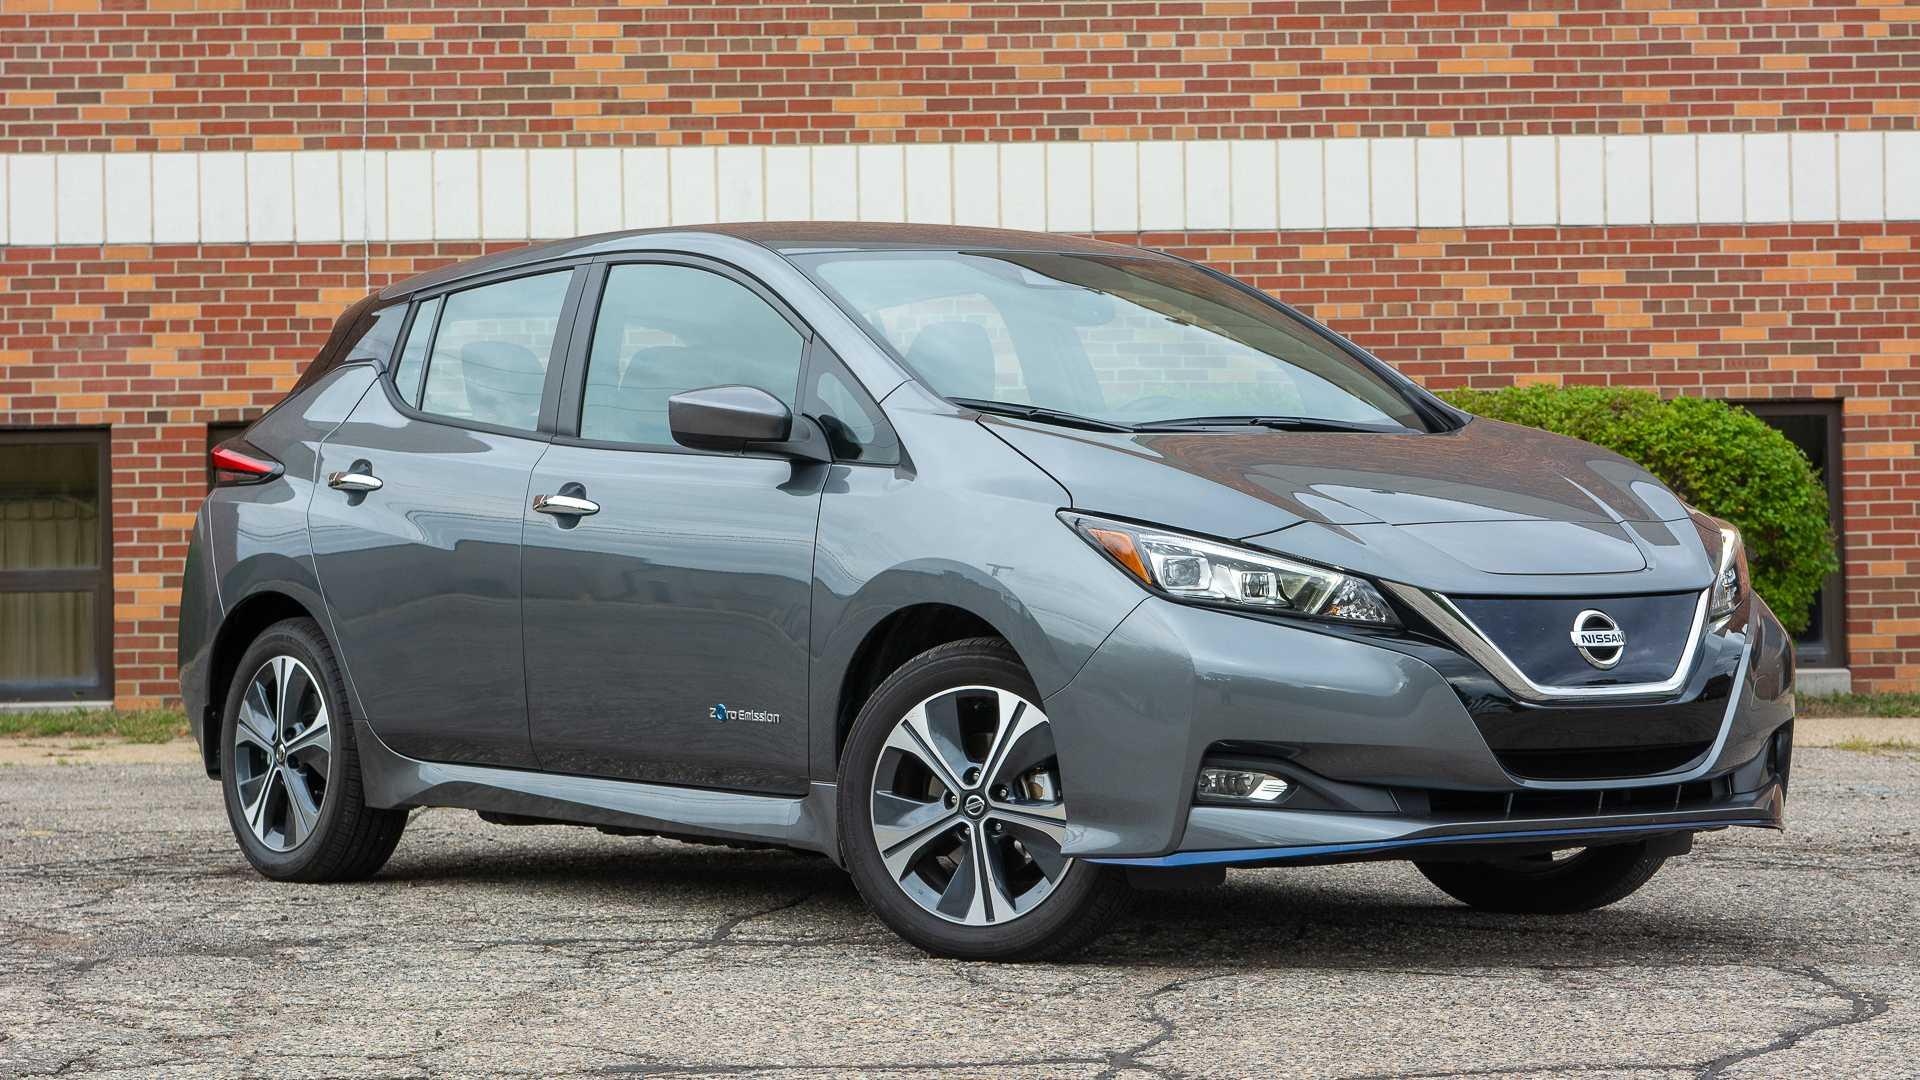 2020 Nissan Leaf Plus Driving Notes: Still A Solid EV